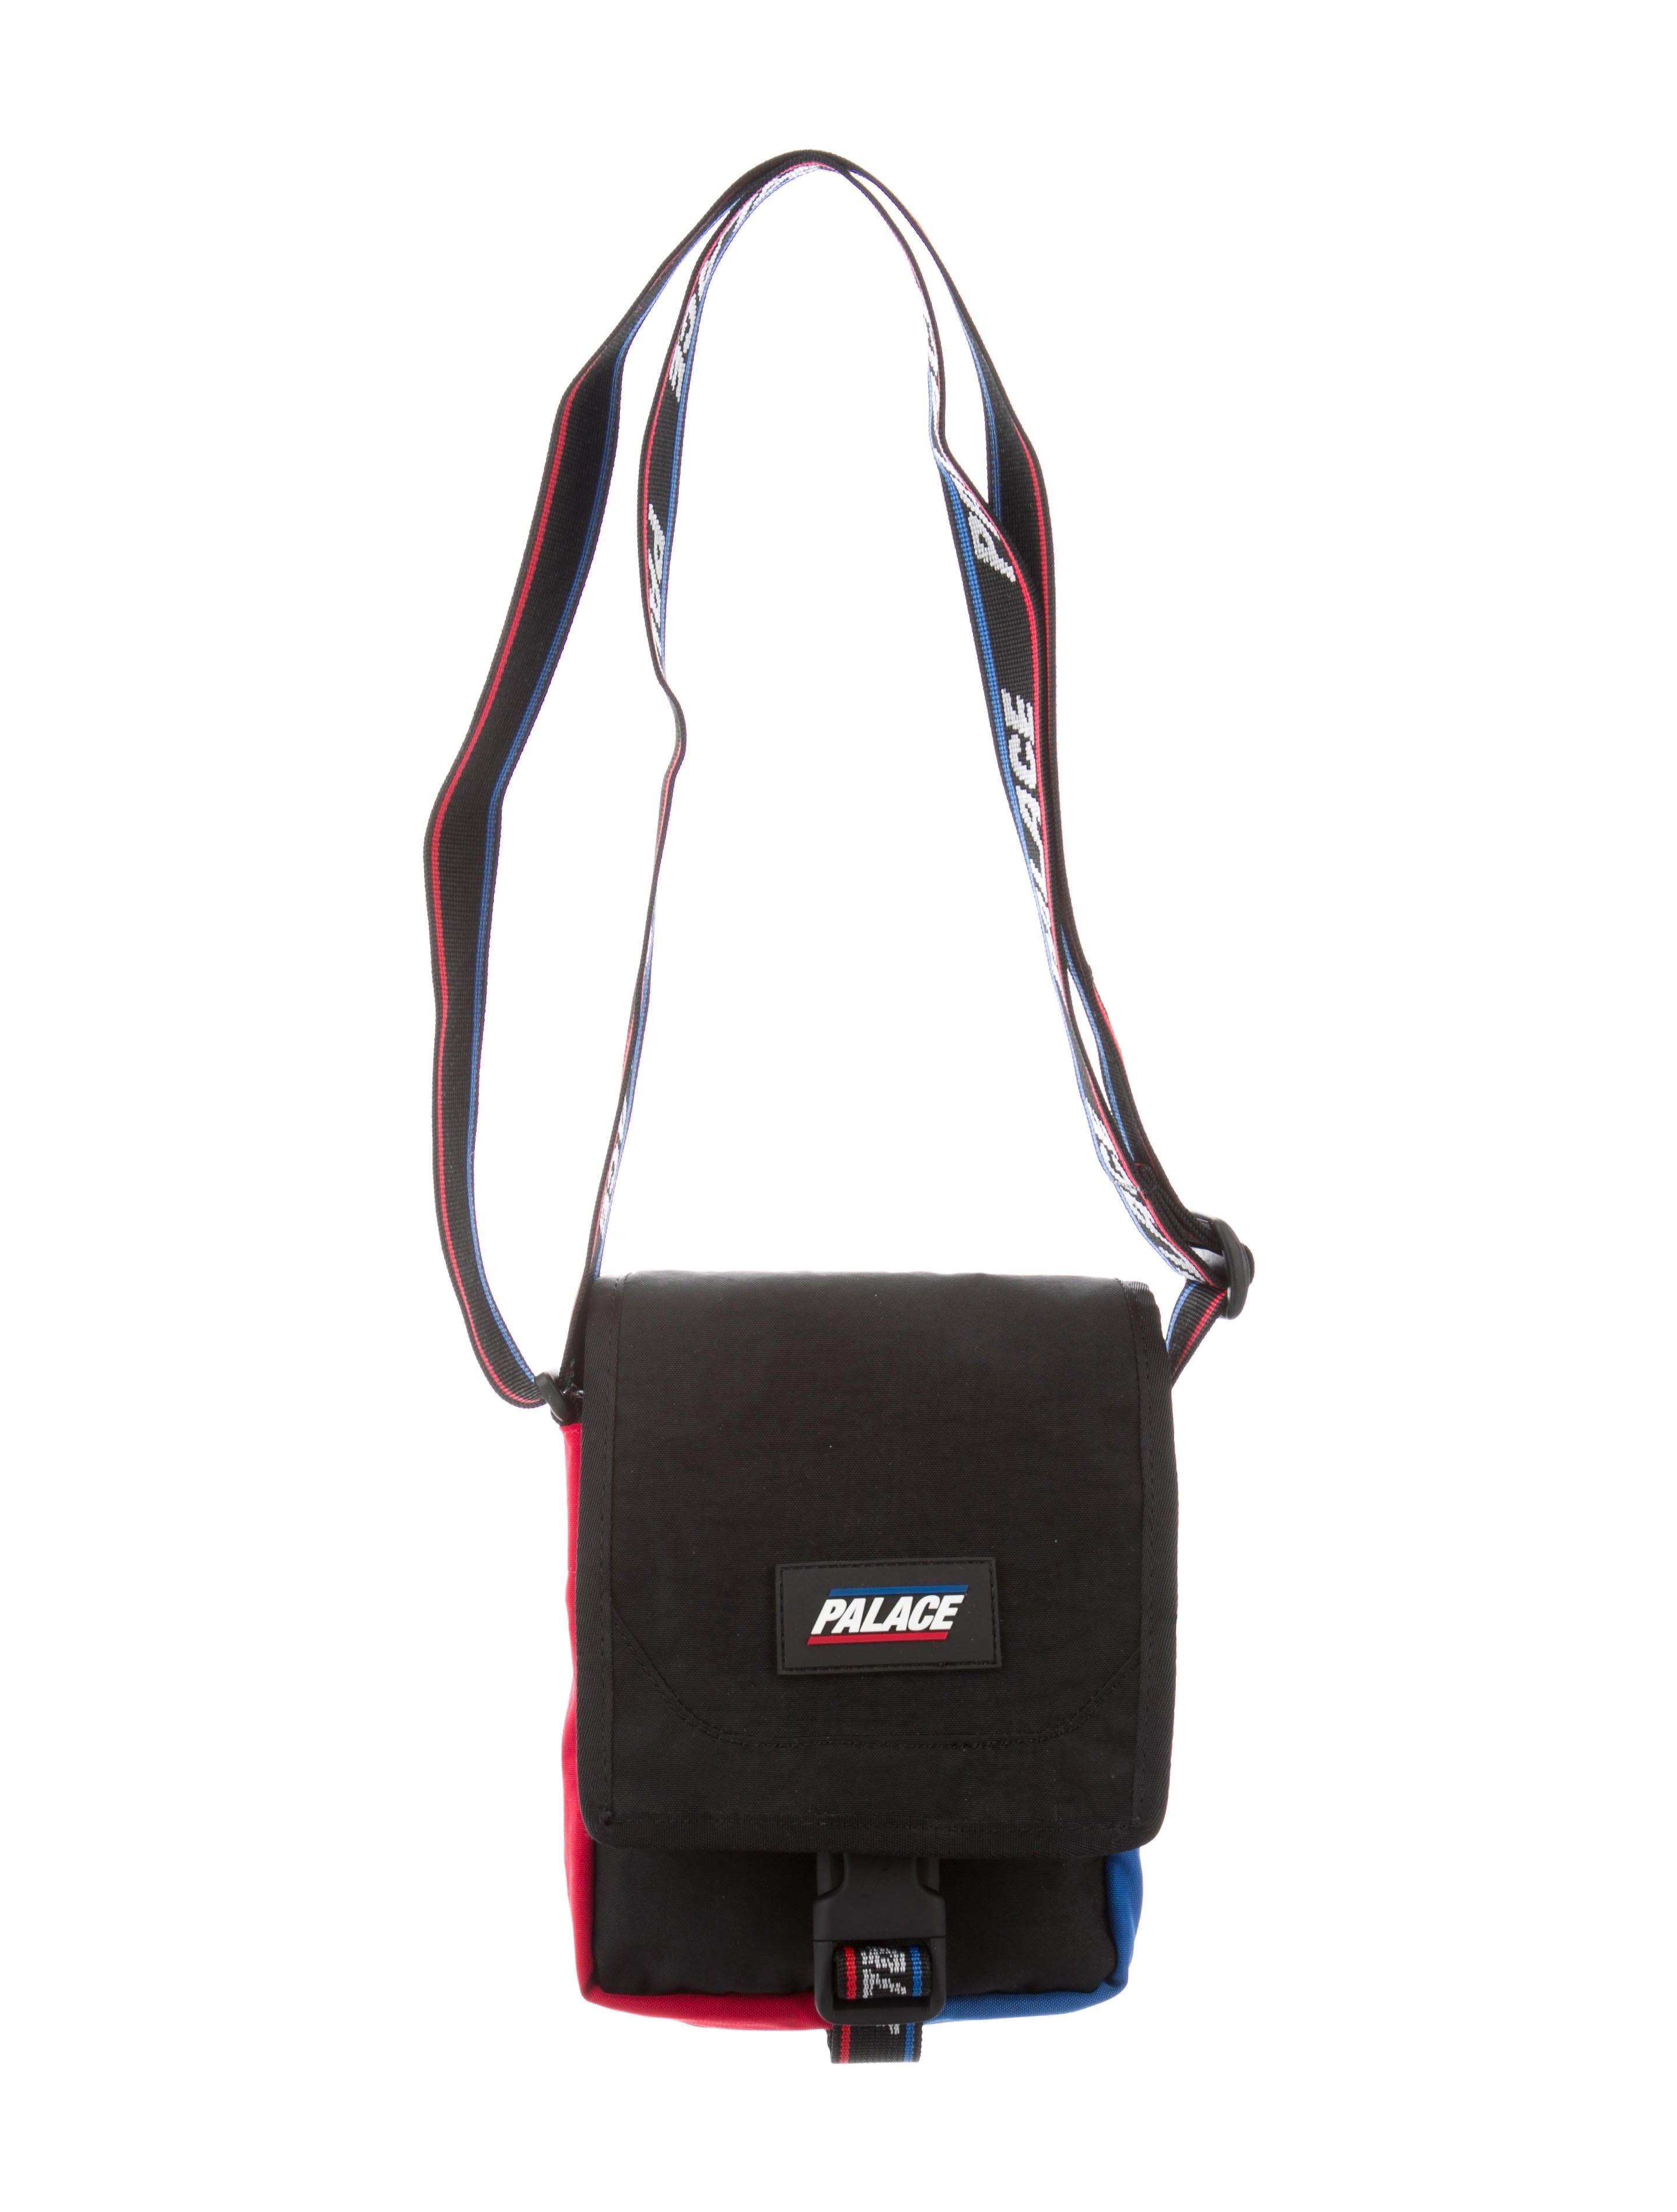 99546f2d8ab2 Palace Skateboards Nylon Messenger Bag - Bags - WALSK20261 | The ...